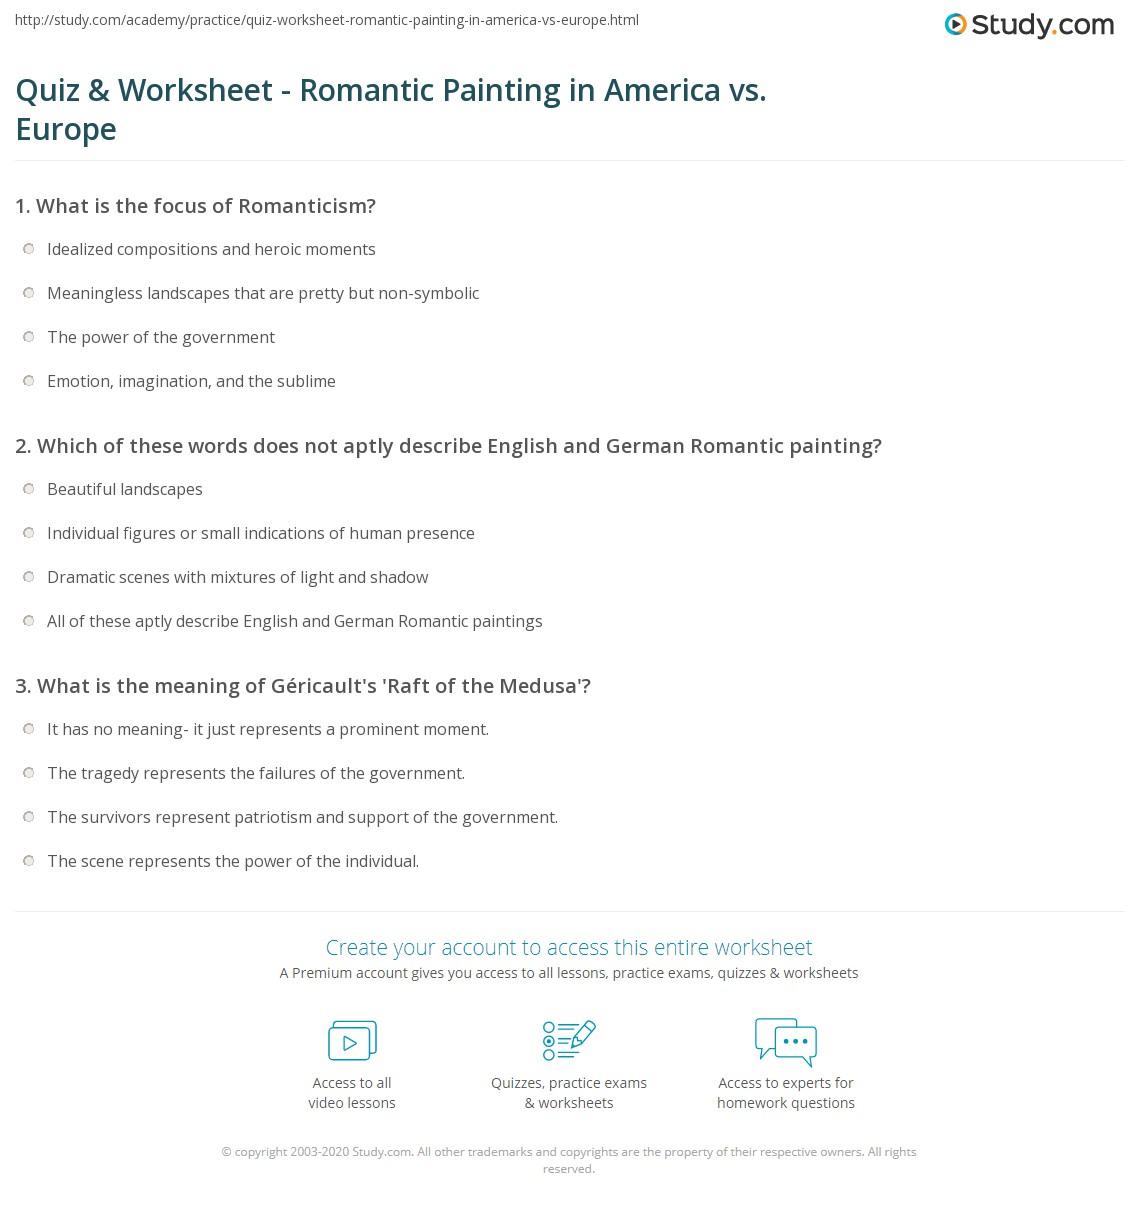 Quiz Worksheet Romantic Painting In America Vs Europe Study Com